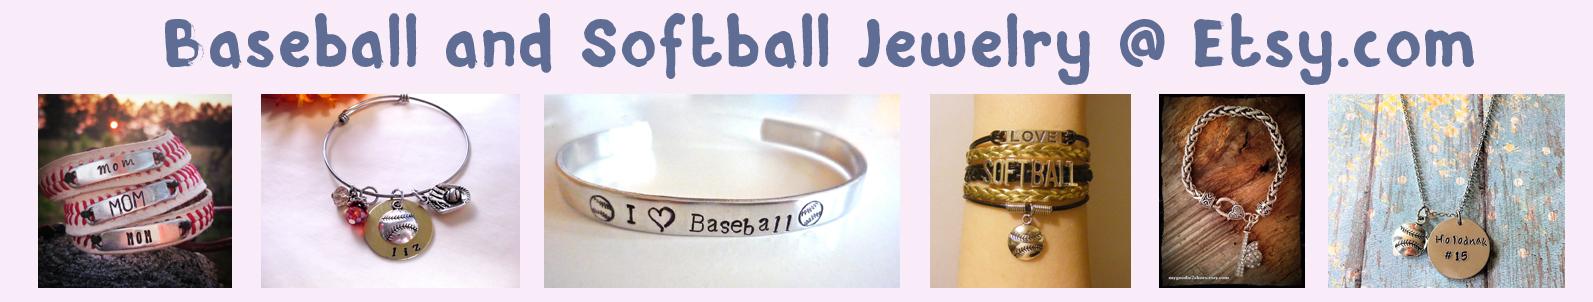 etsy baseball jewelry banner light pink